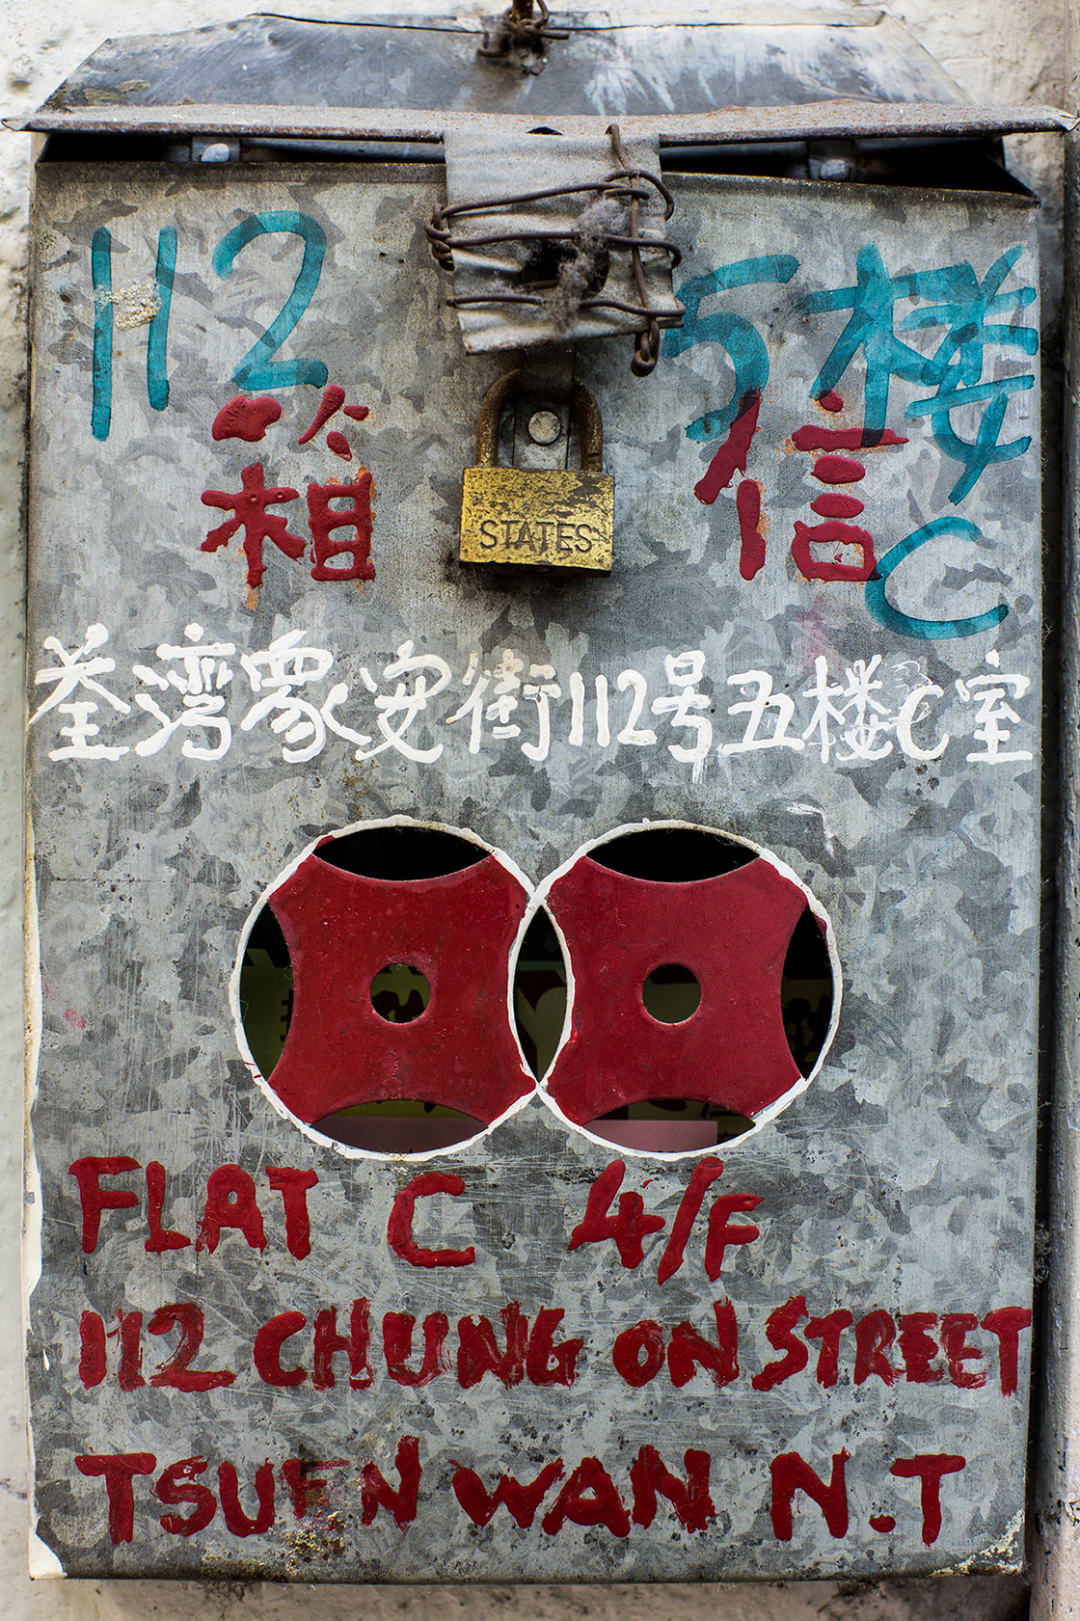 112-Chung On Street, Tsuen Wan - David Elliott